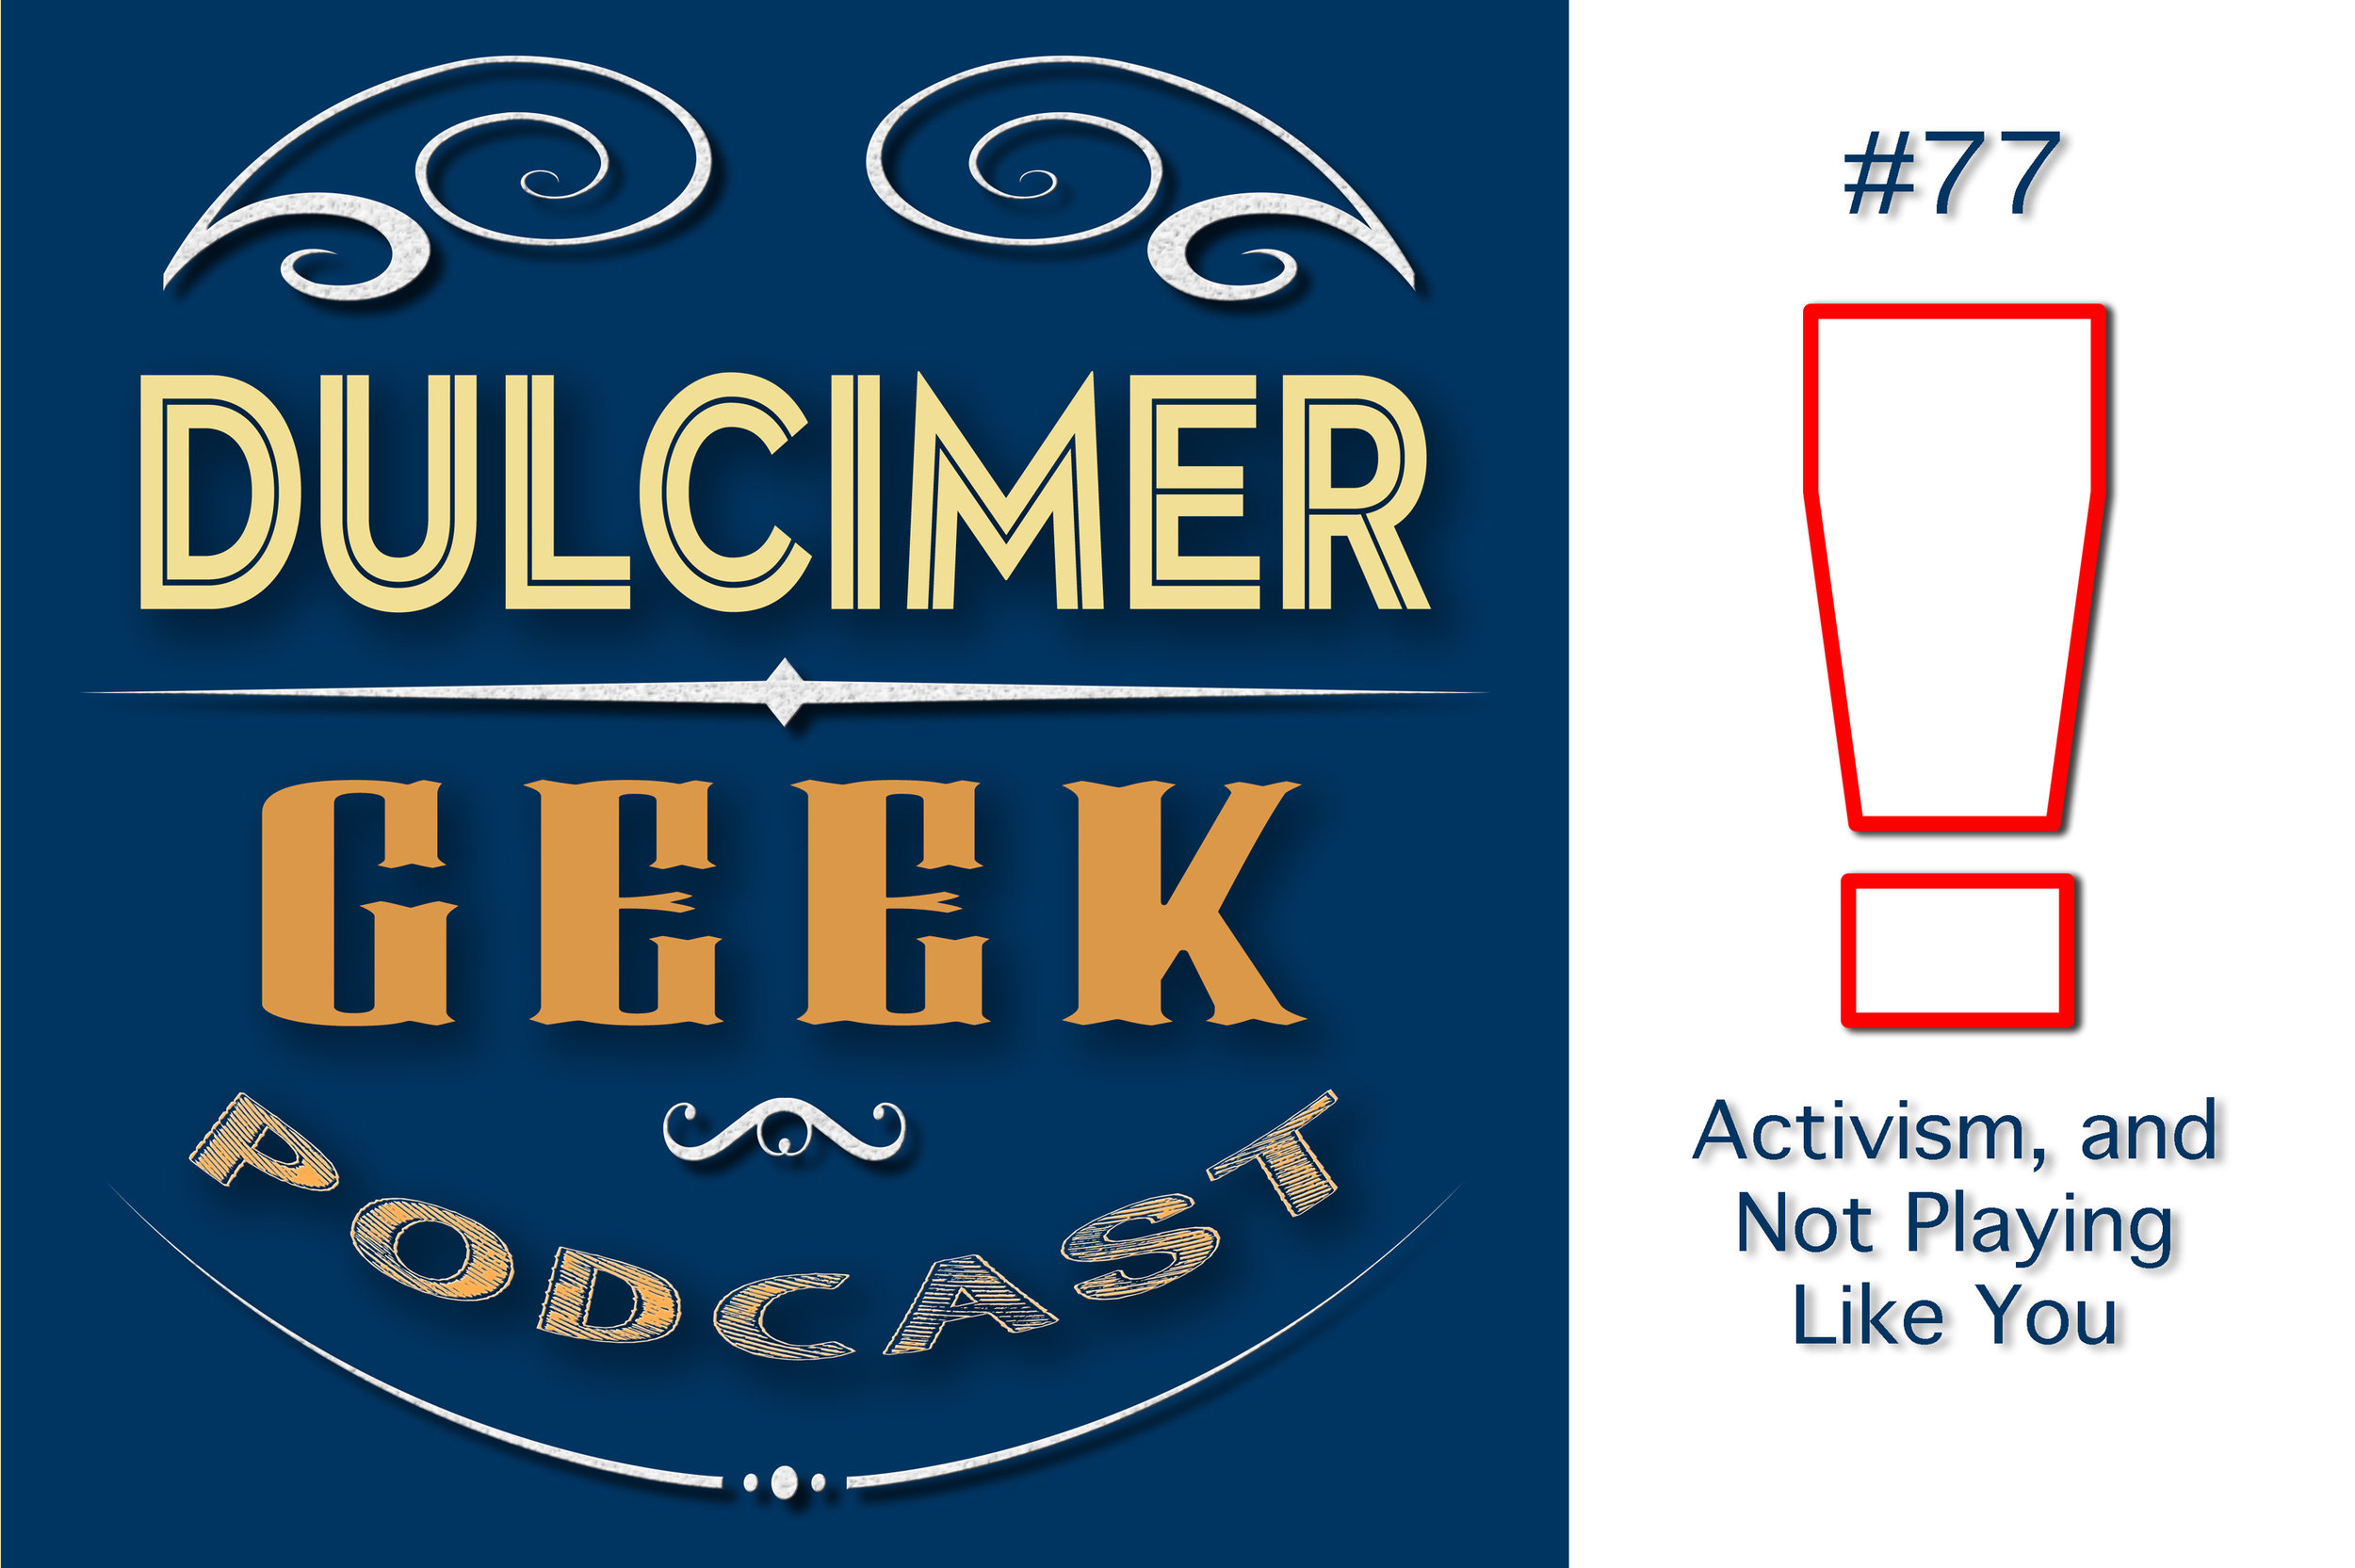 Dulcimer-Geek-Logo-11-15.jpg